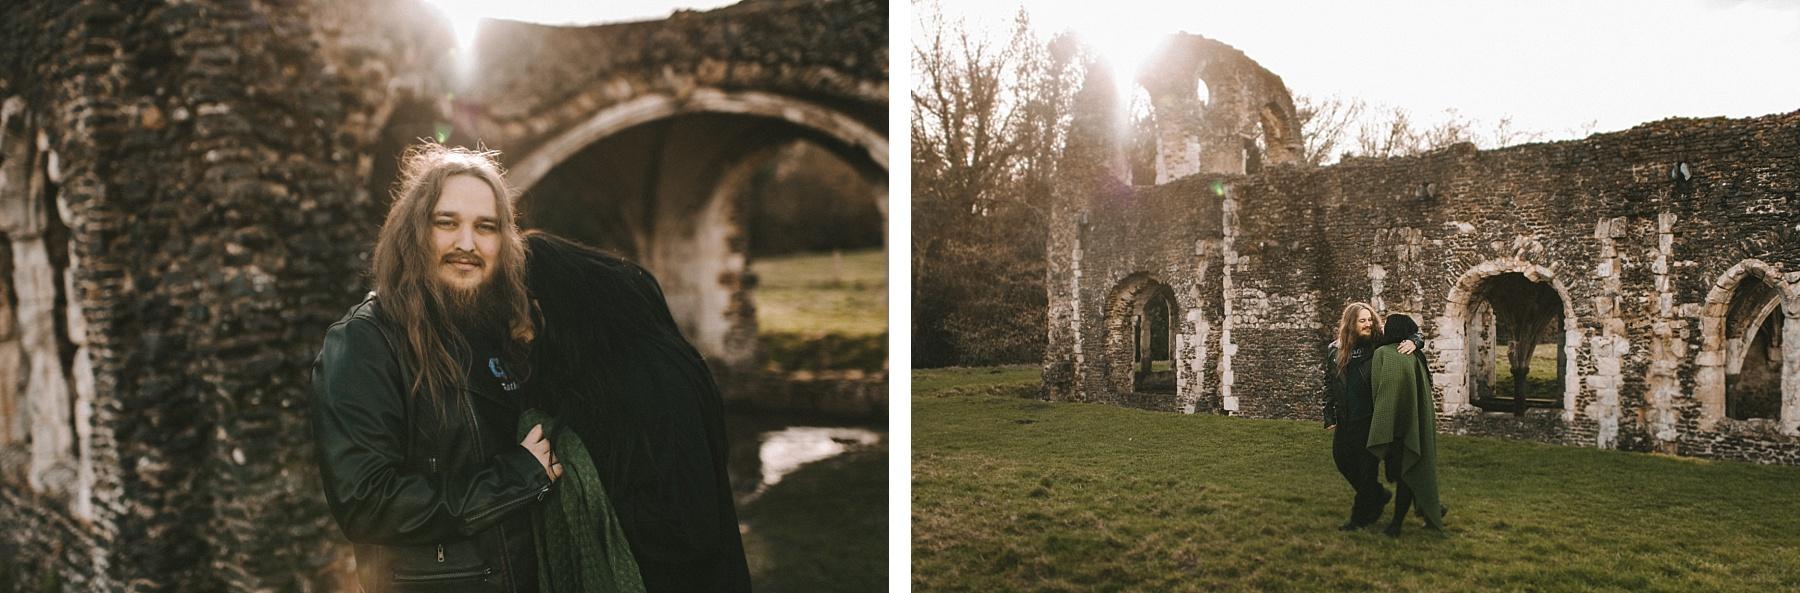 weddin photo by Farnham photographer